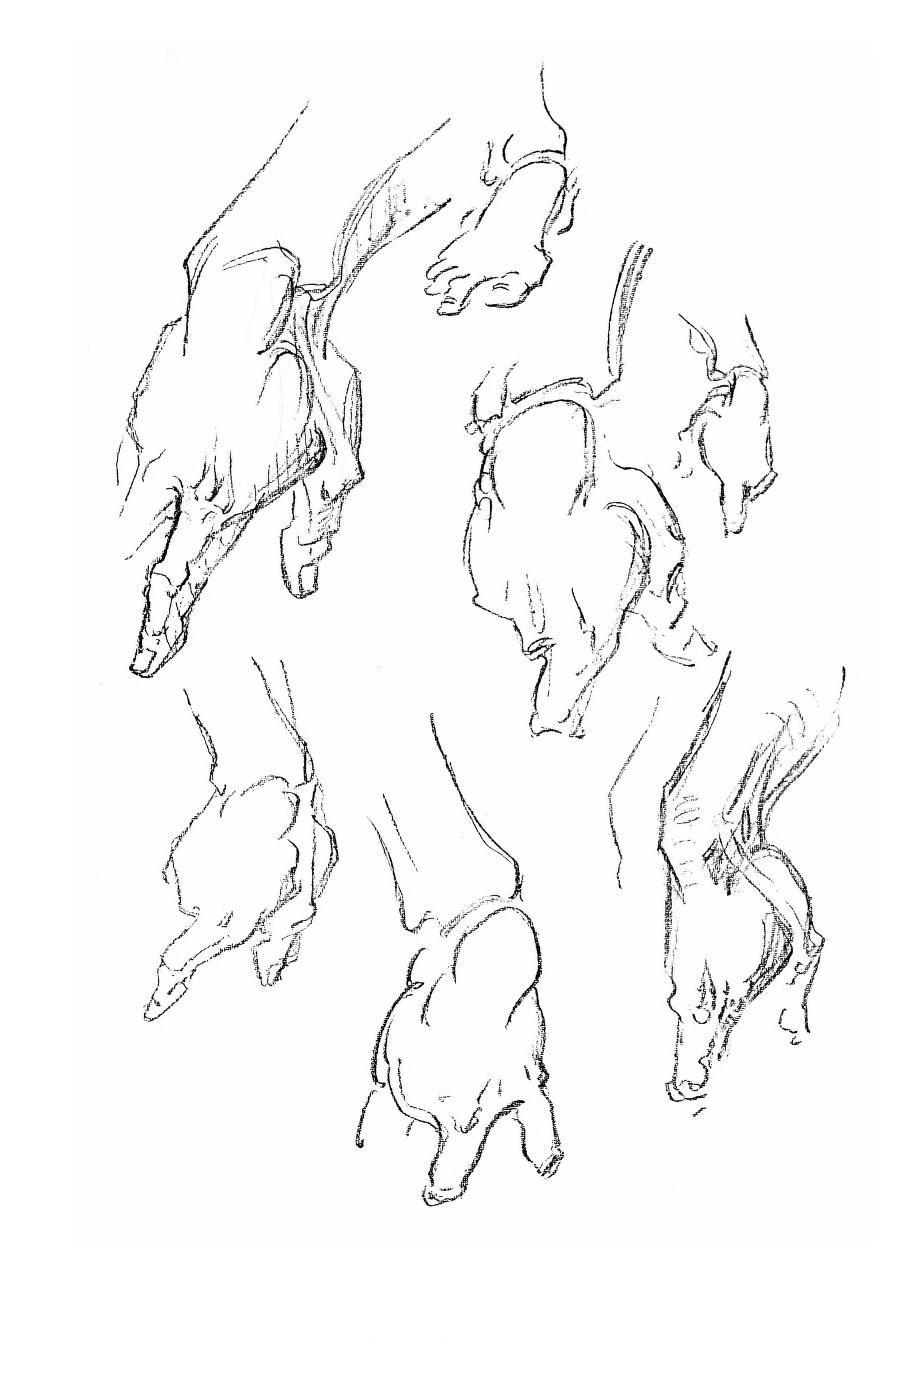 Constructive Anatomy by George Bridgman   AnatoRef - Art Anatomy ...